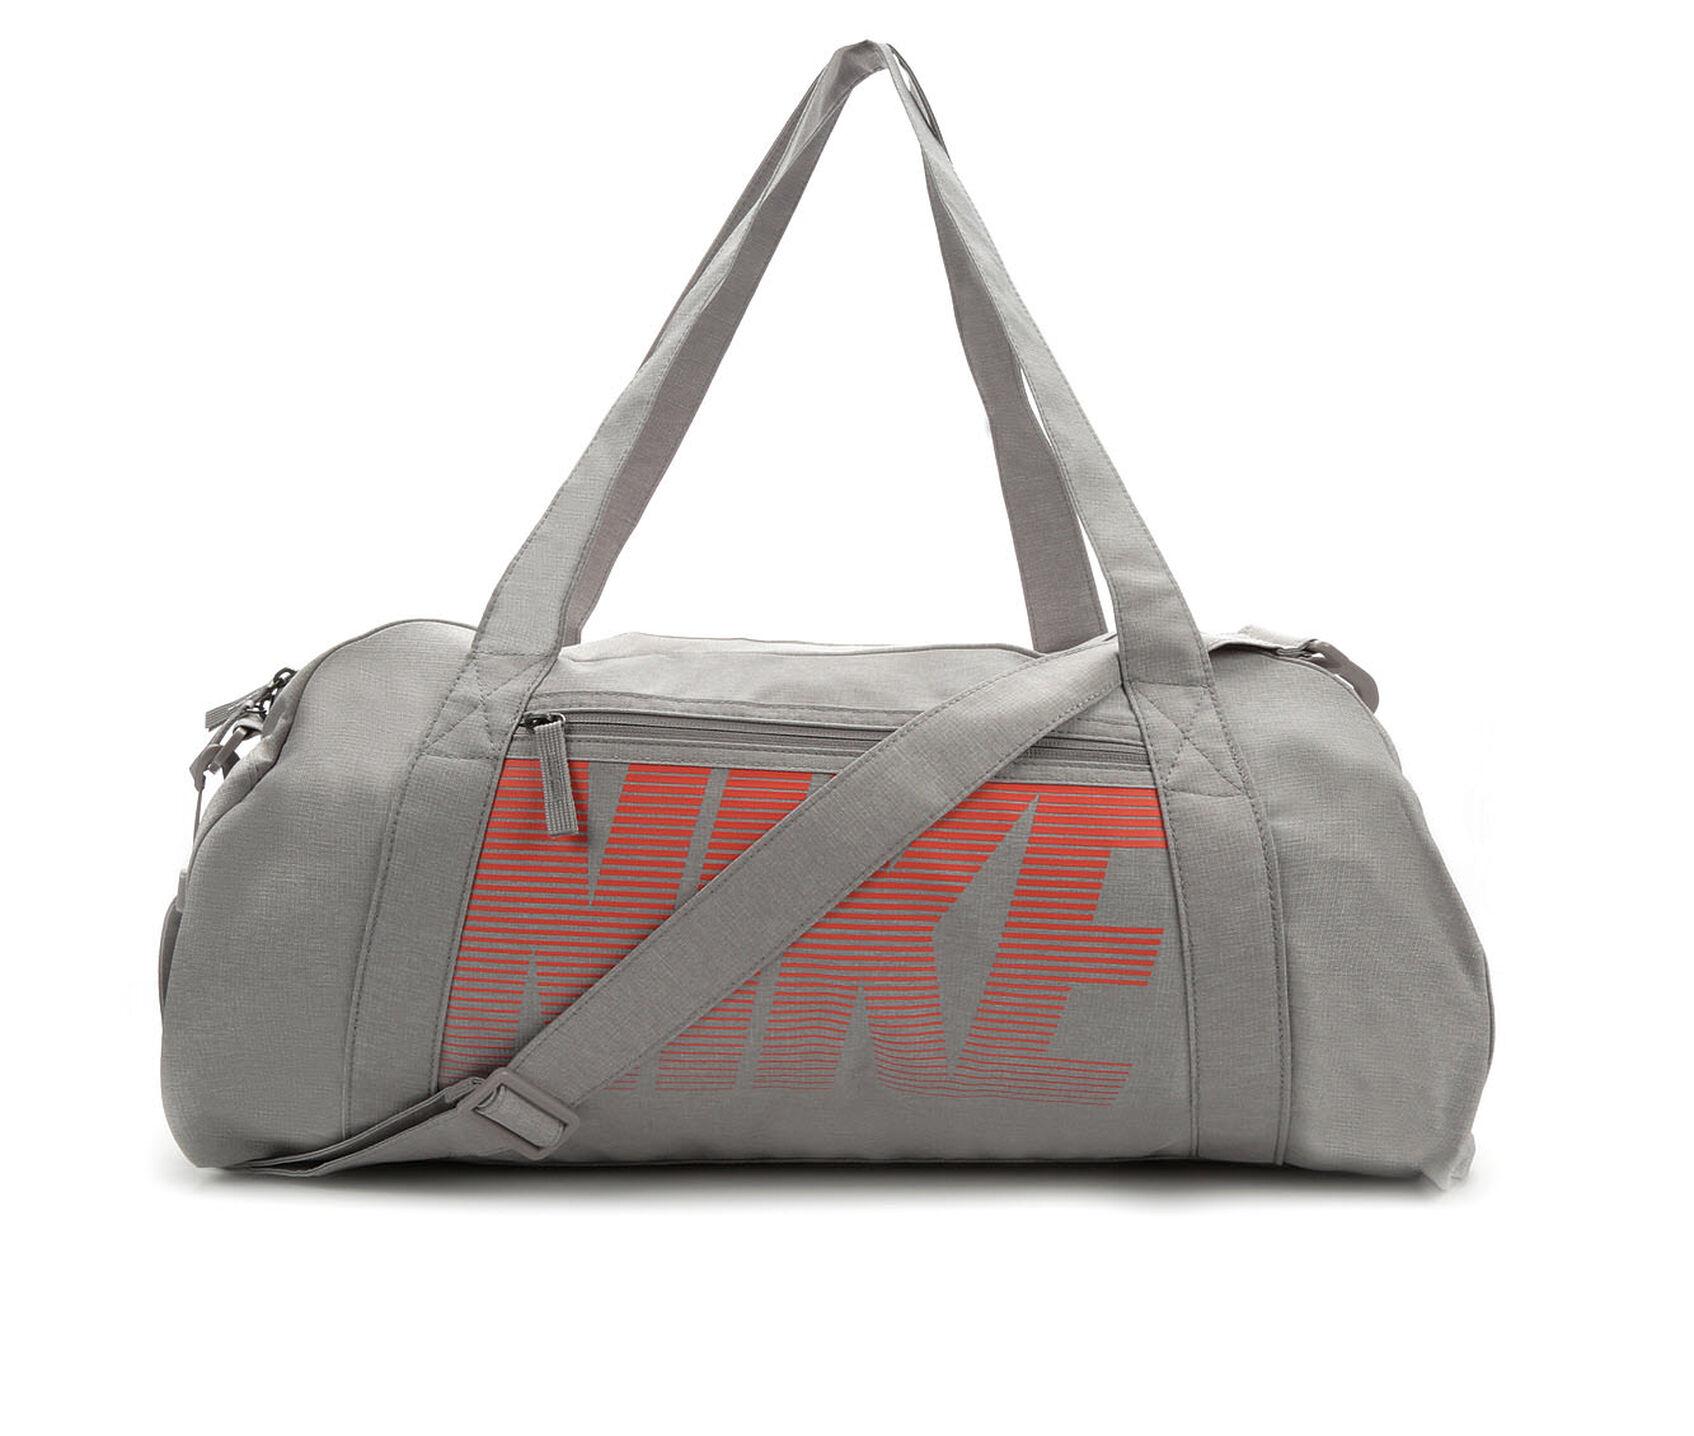 Nike Gym Club Duffel Bag. Previous cf1cfa0c8a5b0